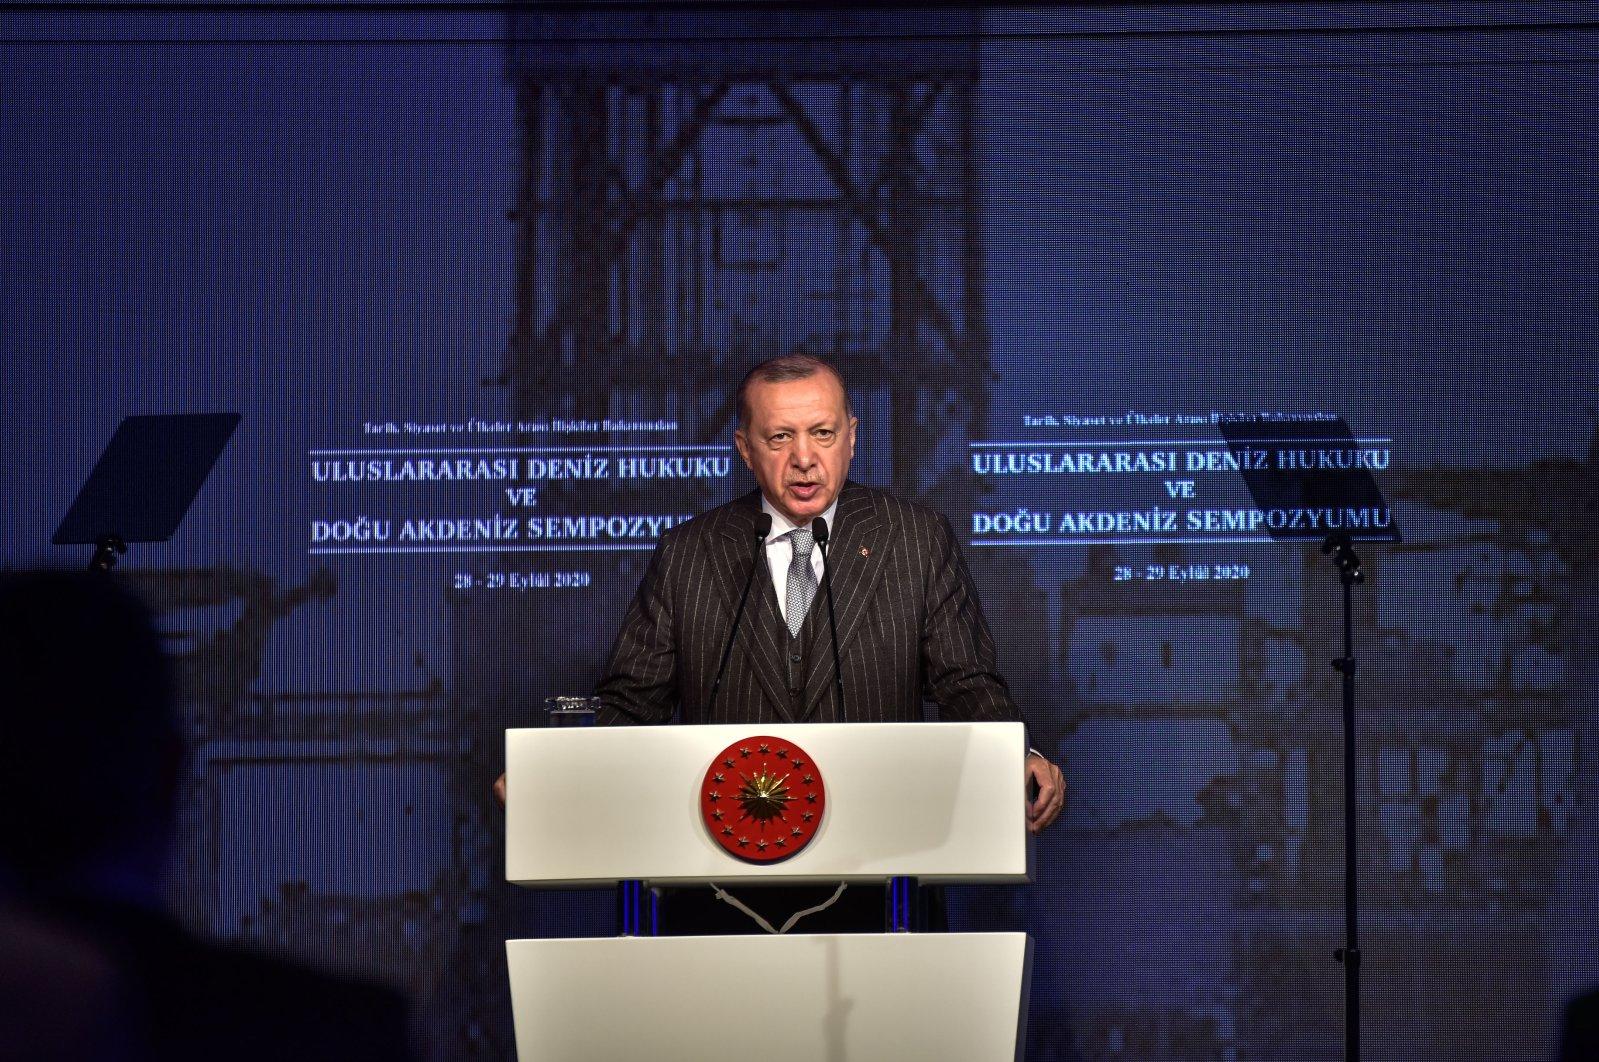 President Recep Tayyip Erdoğan speaks at the International Maritime Law and Eastern Mediterranean Symposium in Istanbul, Turkey, Sept. 28, 2020 (DHA Photo)